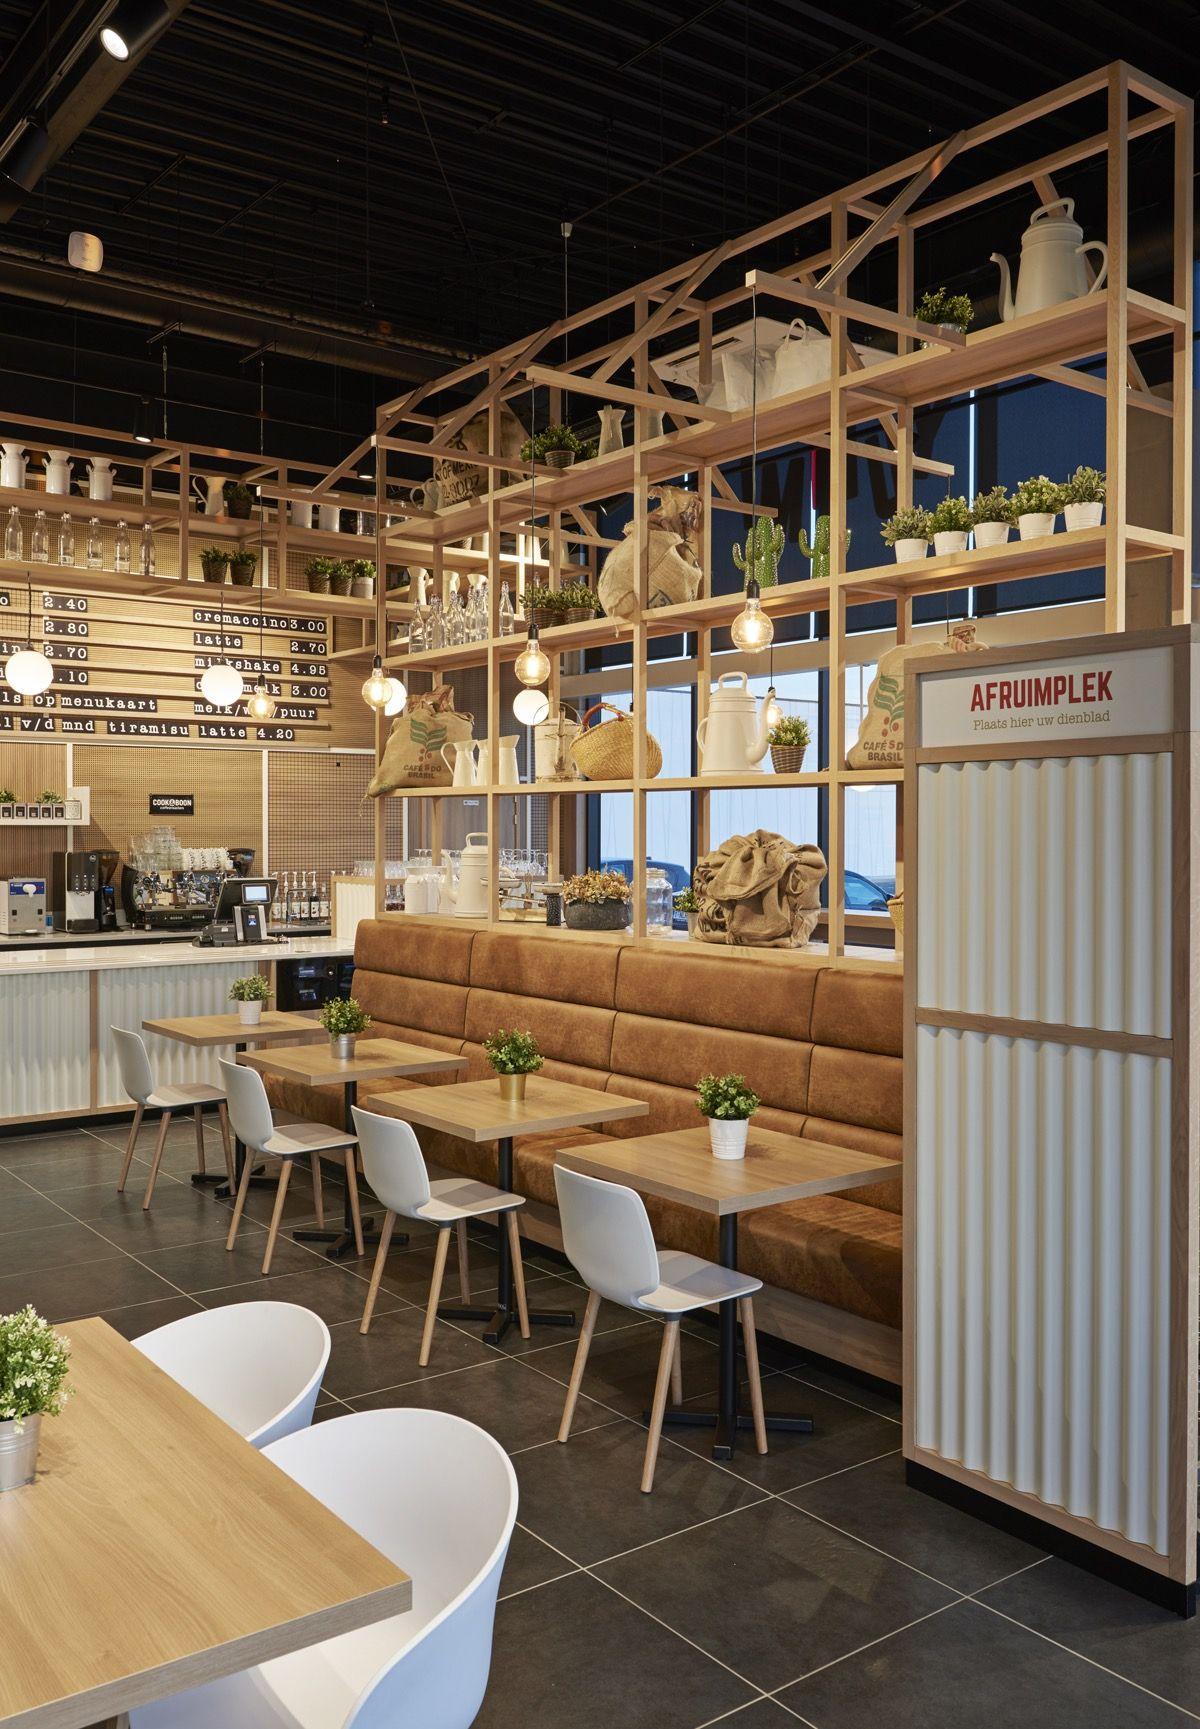 Housing Market Predictions 2021 Will It Crash In 2021 Or 2022 Cafe Interior Design Coffee Bar Design Coffee Shop Interior Design